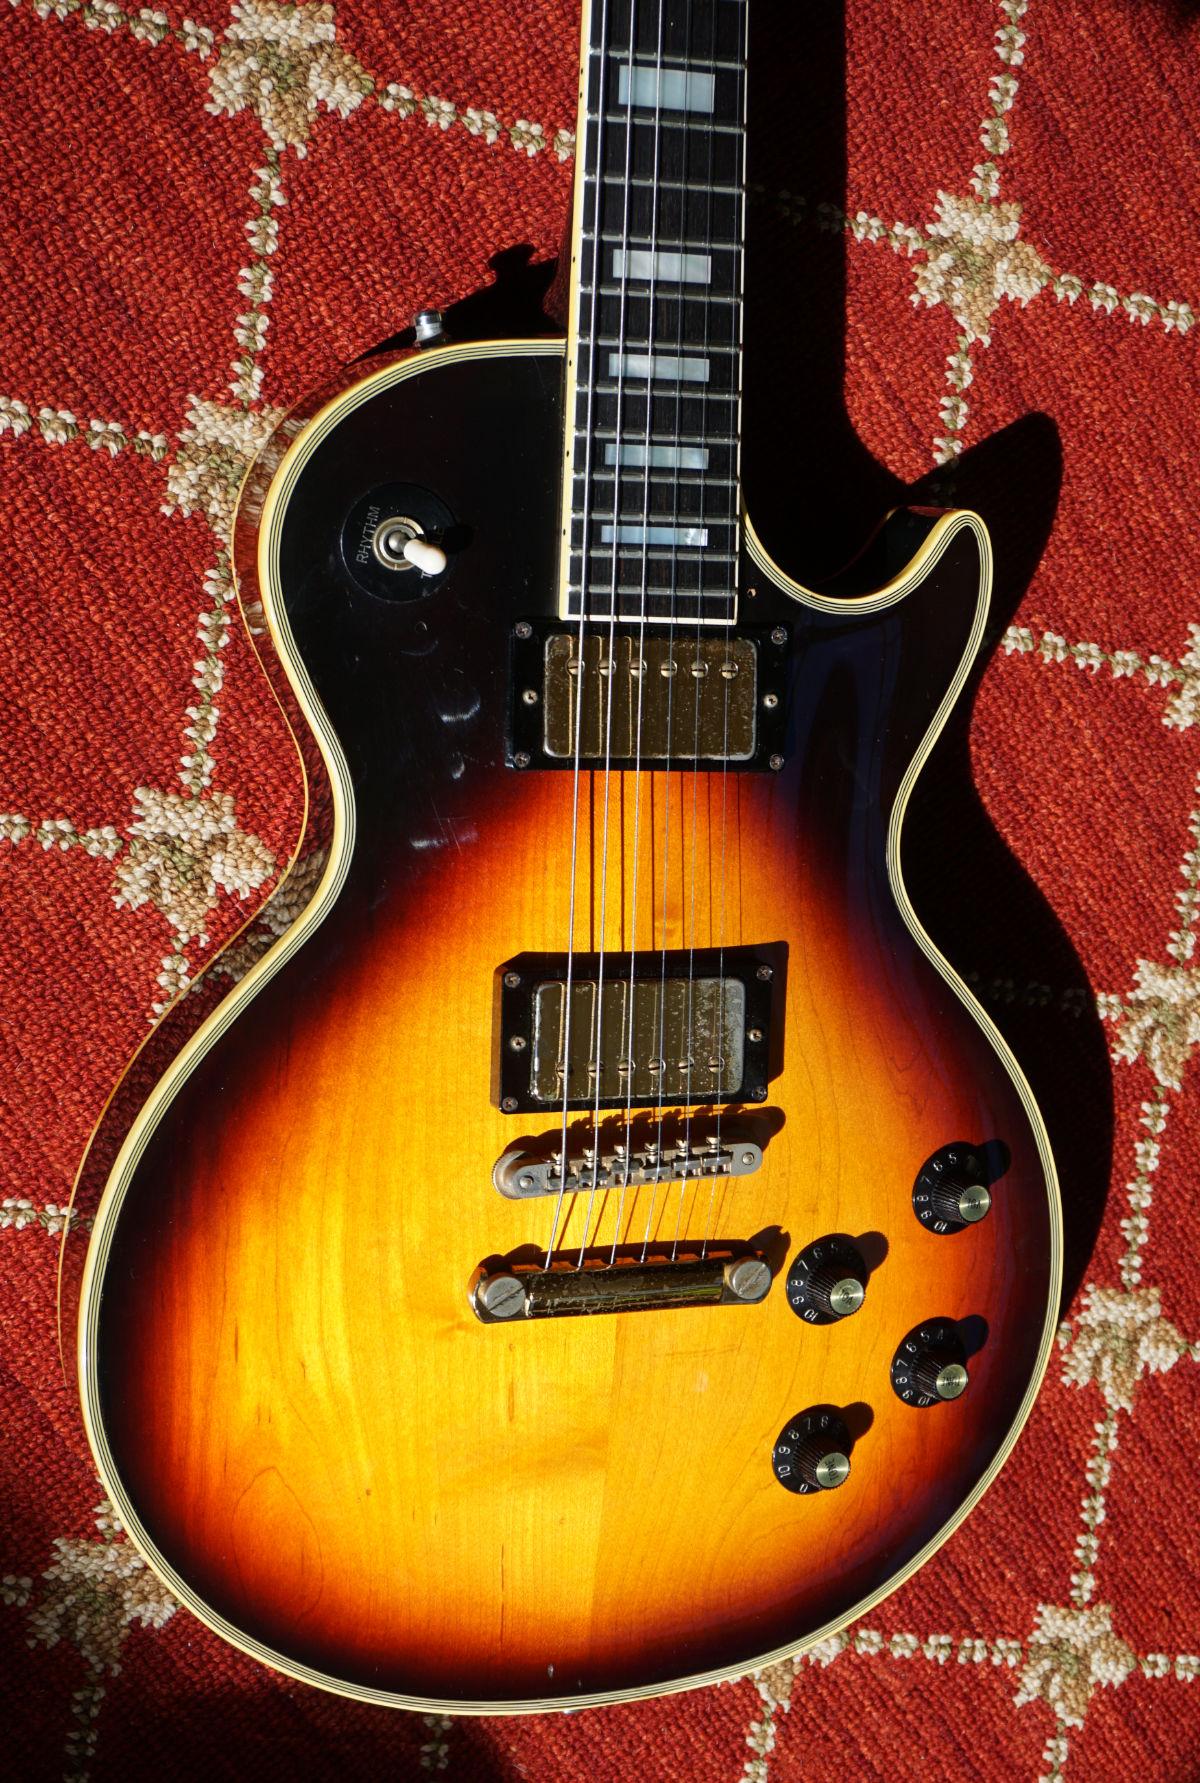 Greco EG 1000C Black Sunburst 1980